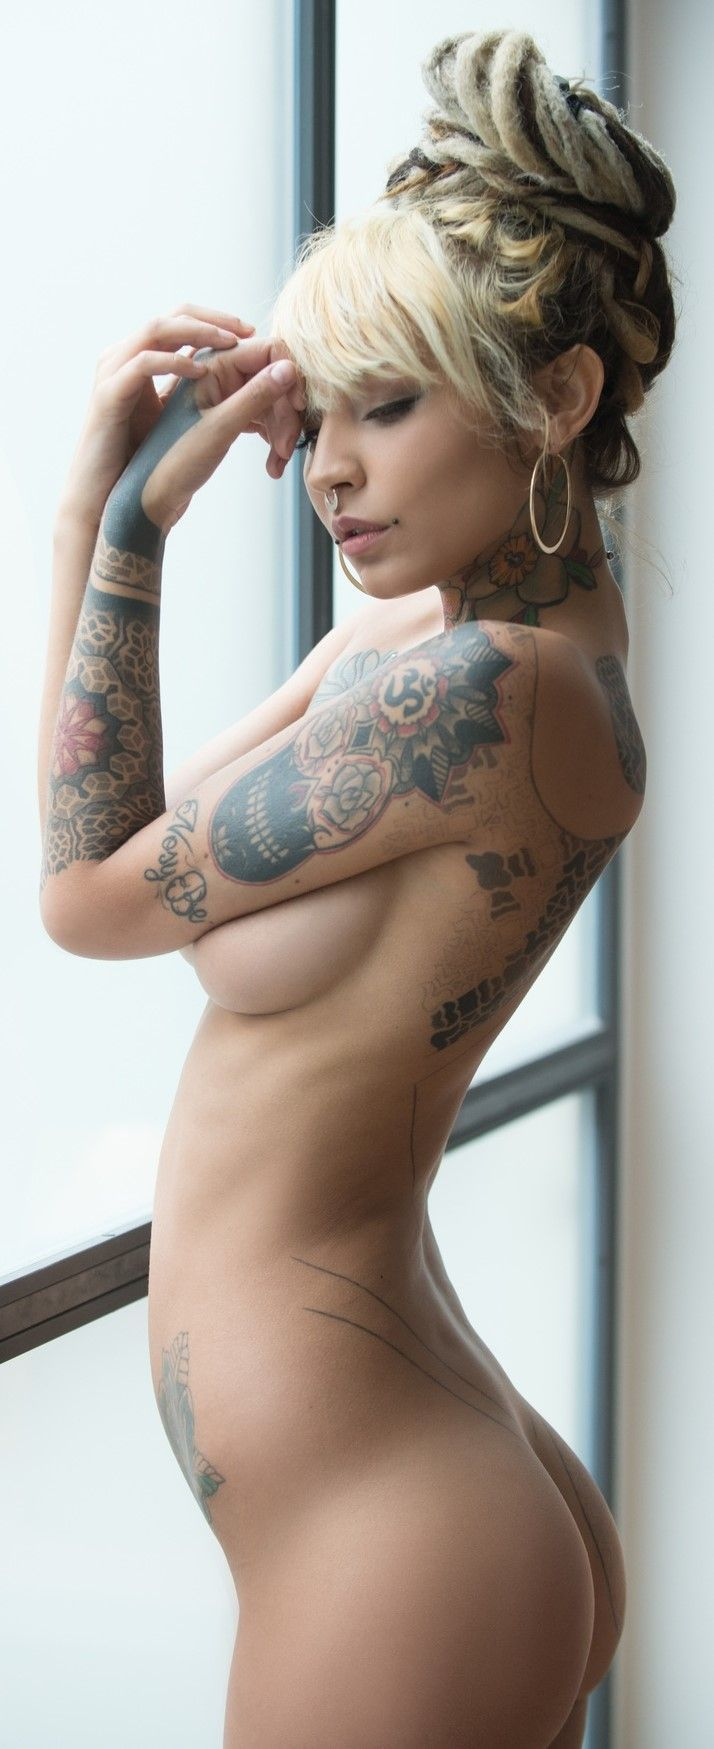 tattoo babes naked thread